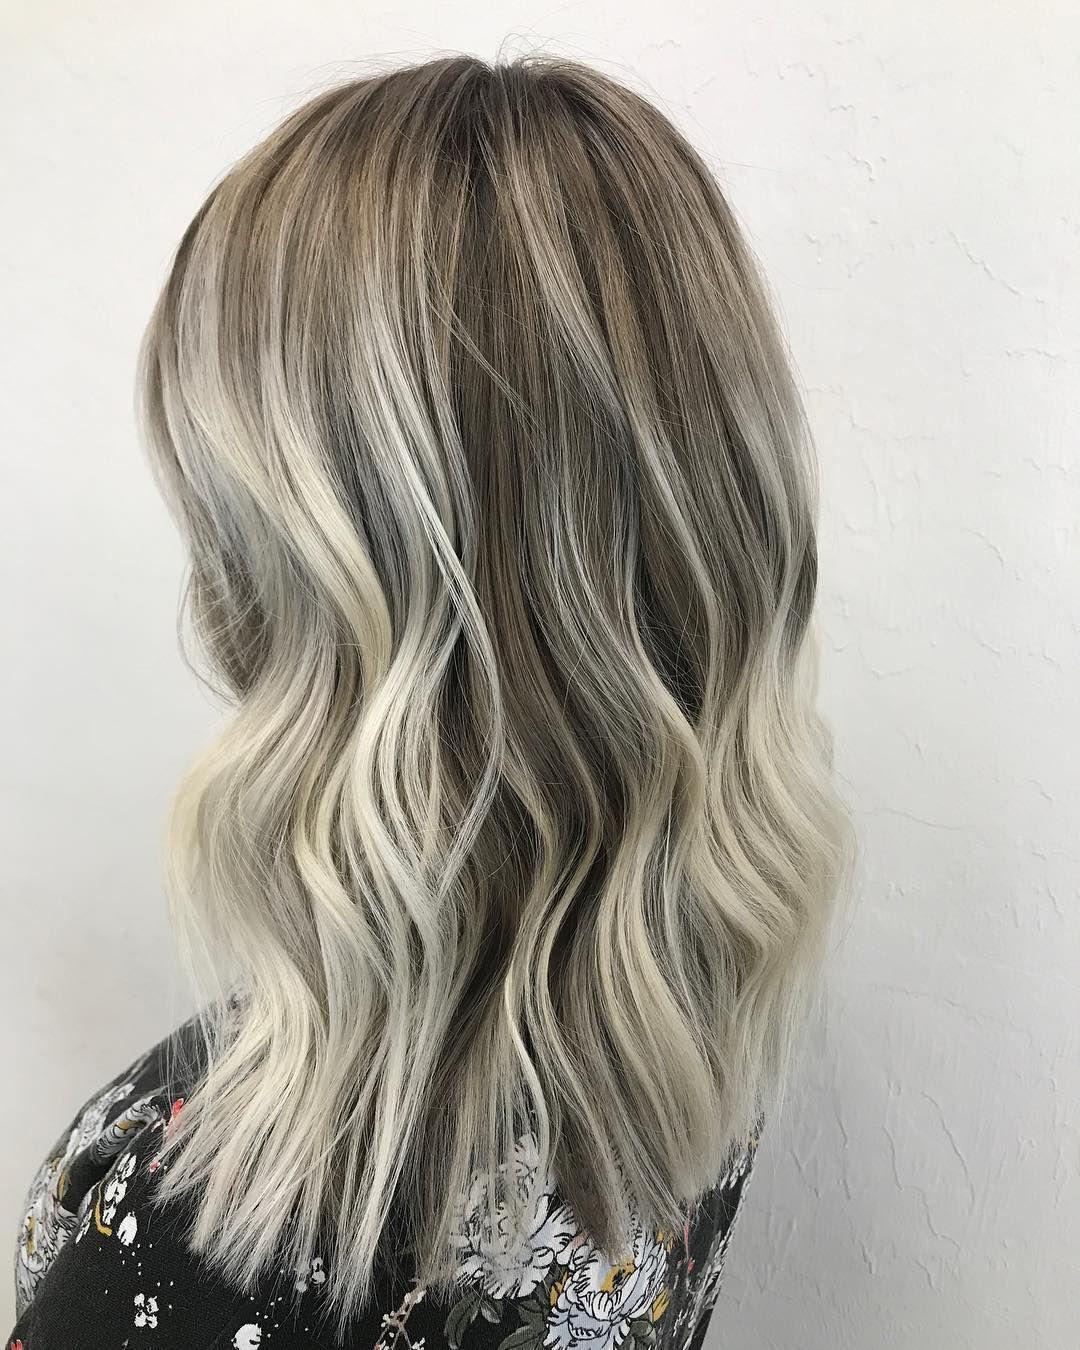 Cool Icy Blond Balayage Long Hair Styles Hair Styles Balayage